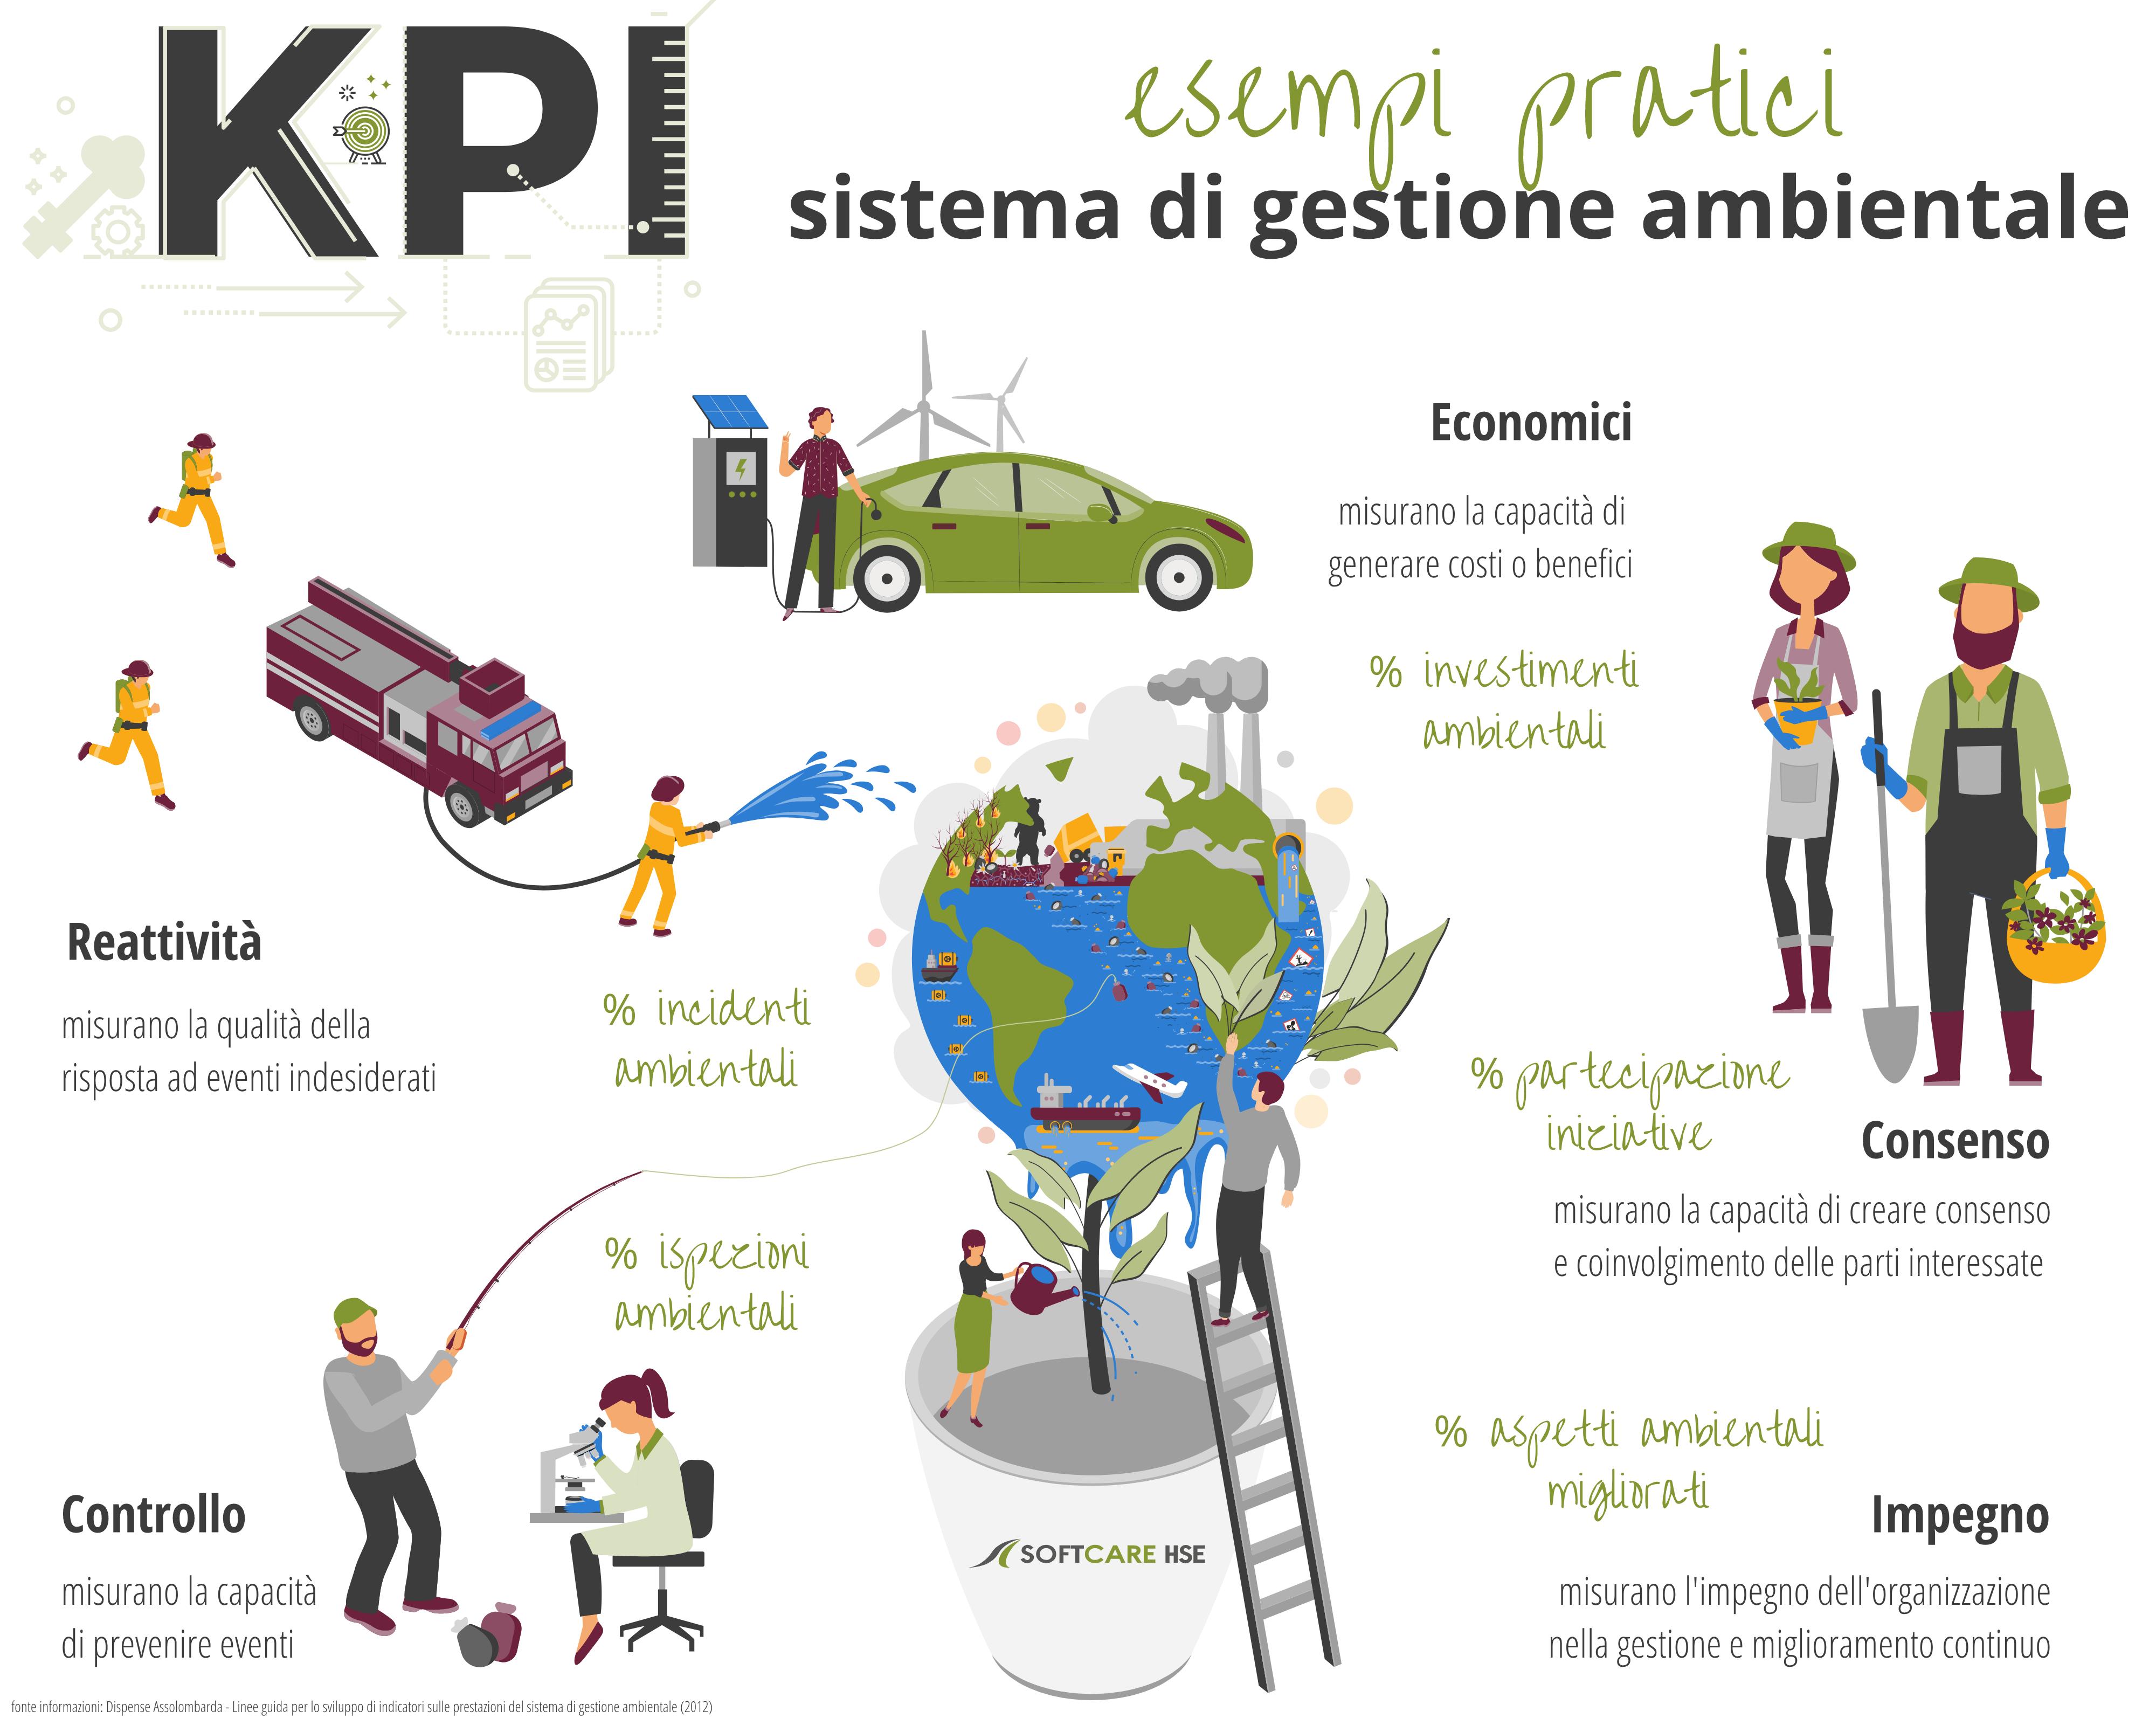 sistema di gestione ambientale esempi KPI proattivi ISO 14001 e sistema di gestione hse software SOFTCAREHSE obiettivi ambientali